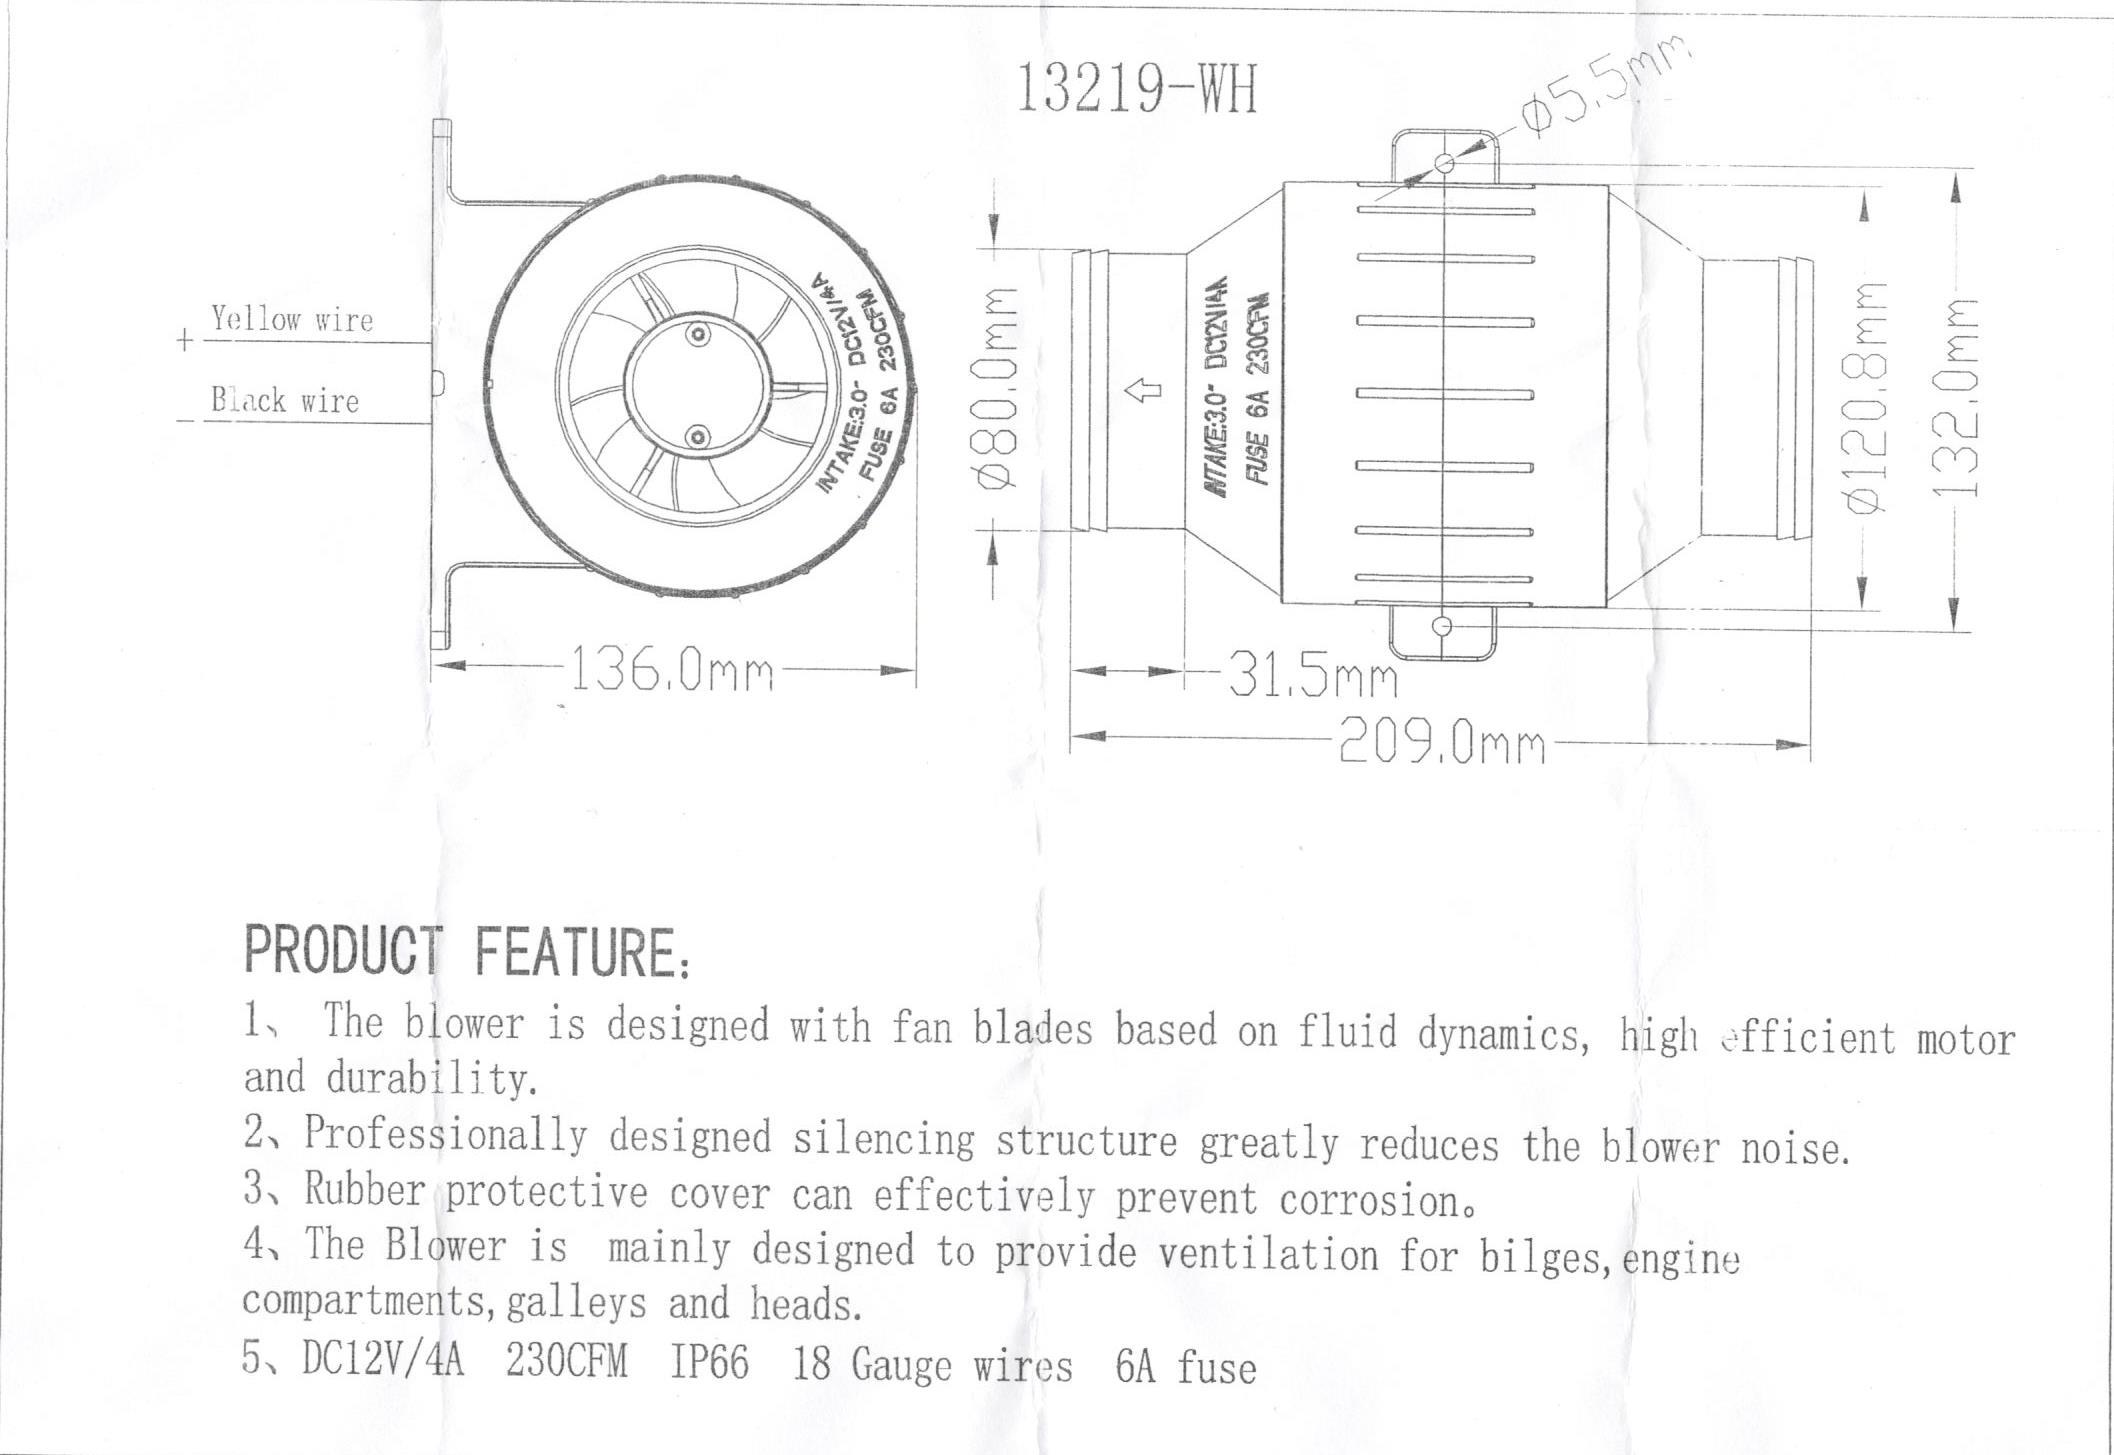 memphis audio wiring diagrams 1993 ford ranger xl radio diagram lithonia 2gtl4